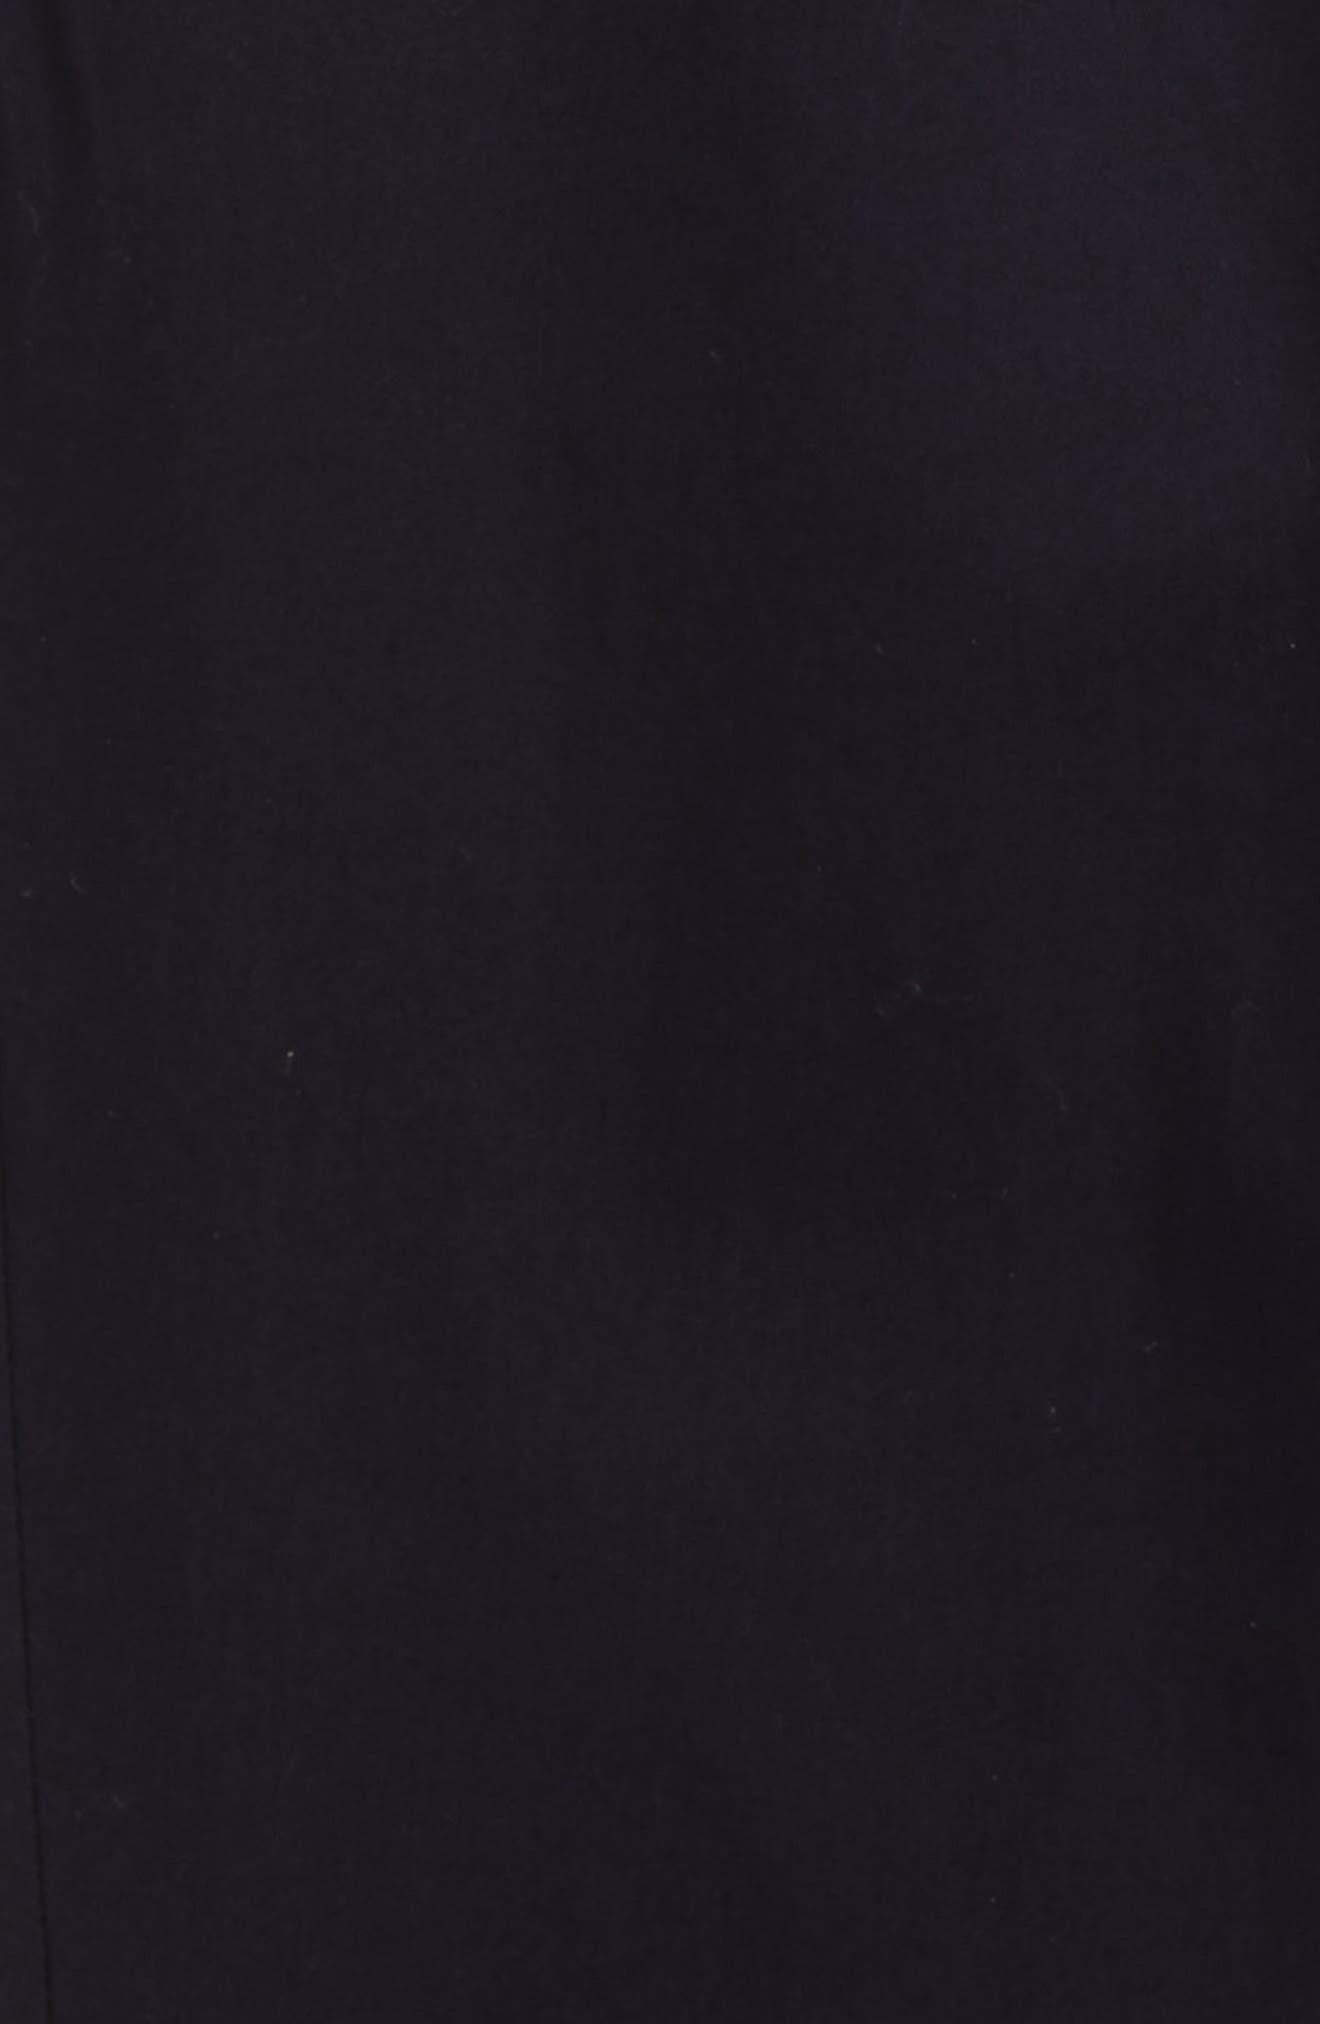 BURBERRY, Teo Straight Leg Pants, Alternate thumbnail 2, color, INK